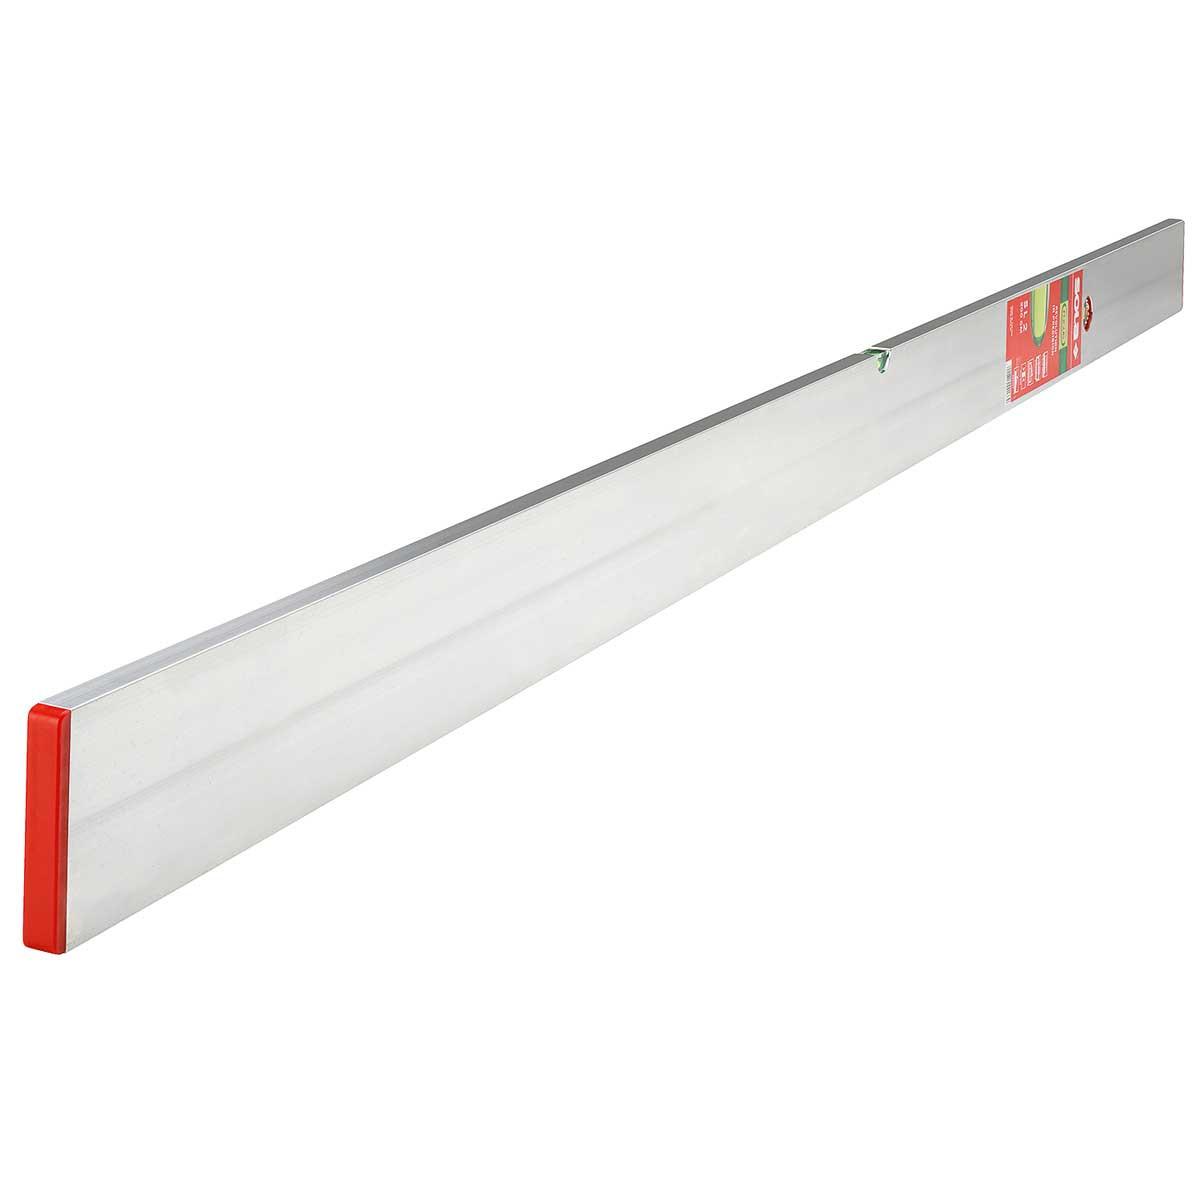 39 inch SL 2 100 Sola Aluminum Screeding Level